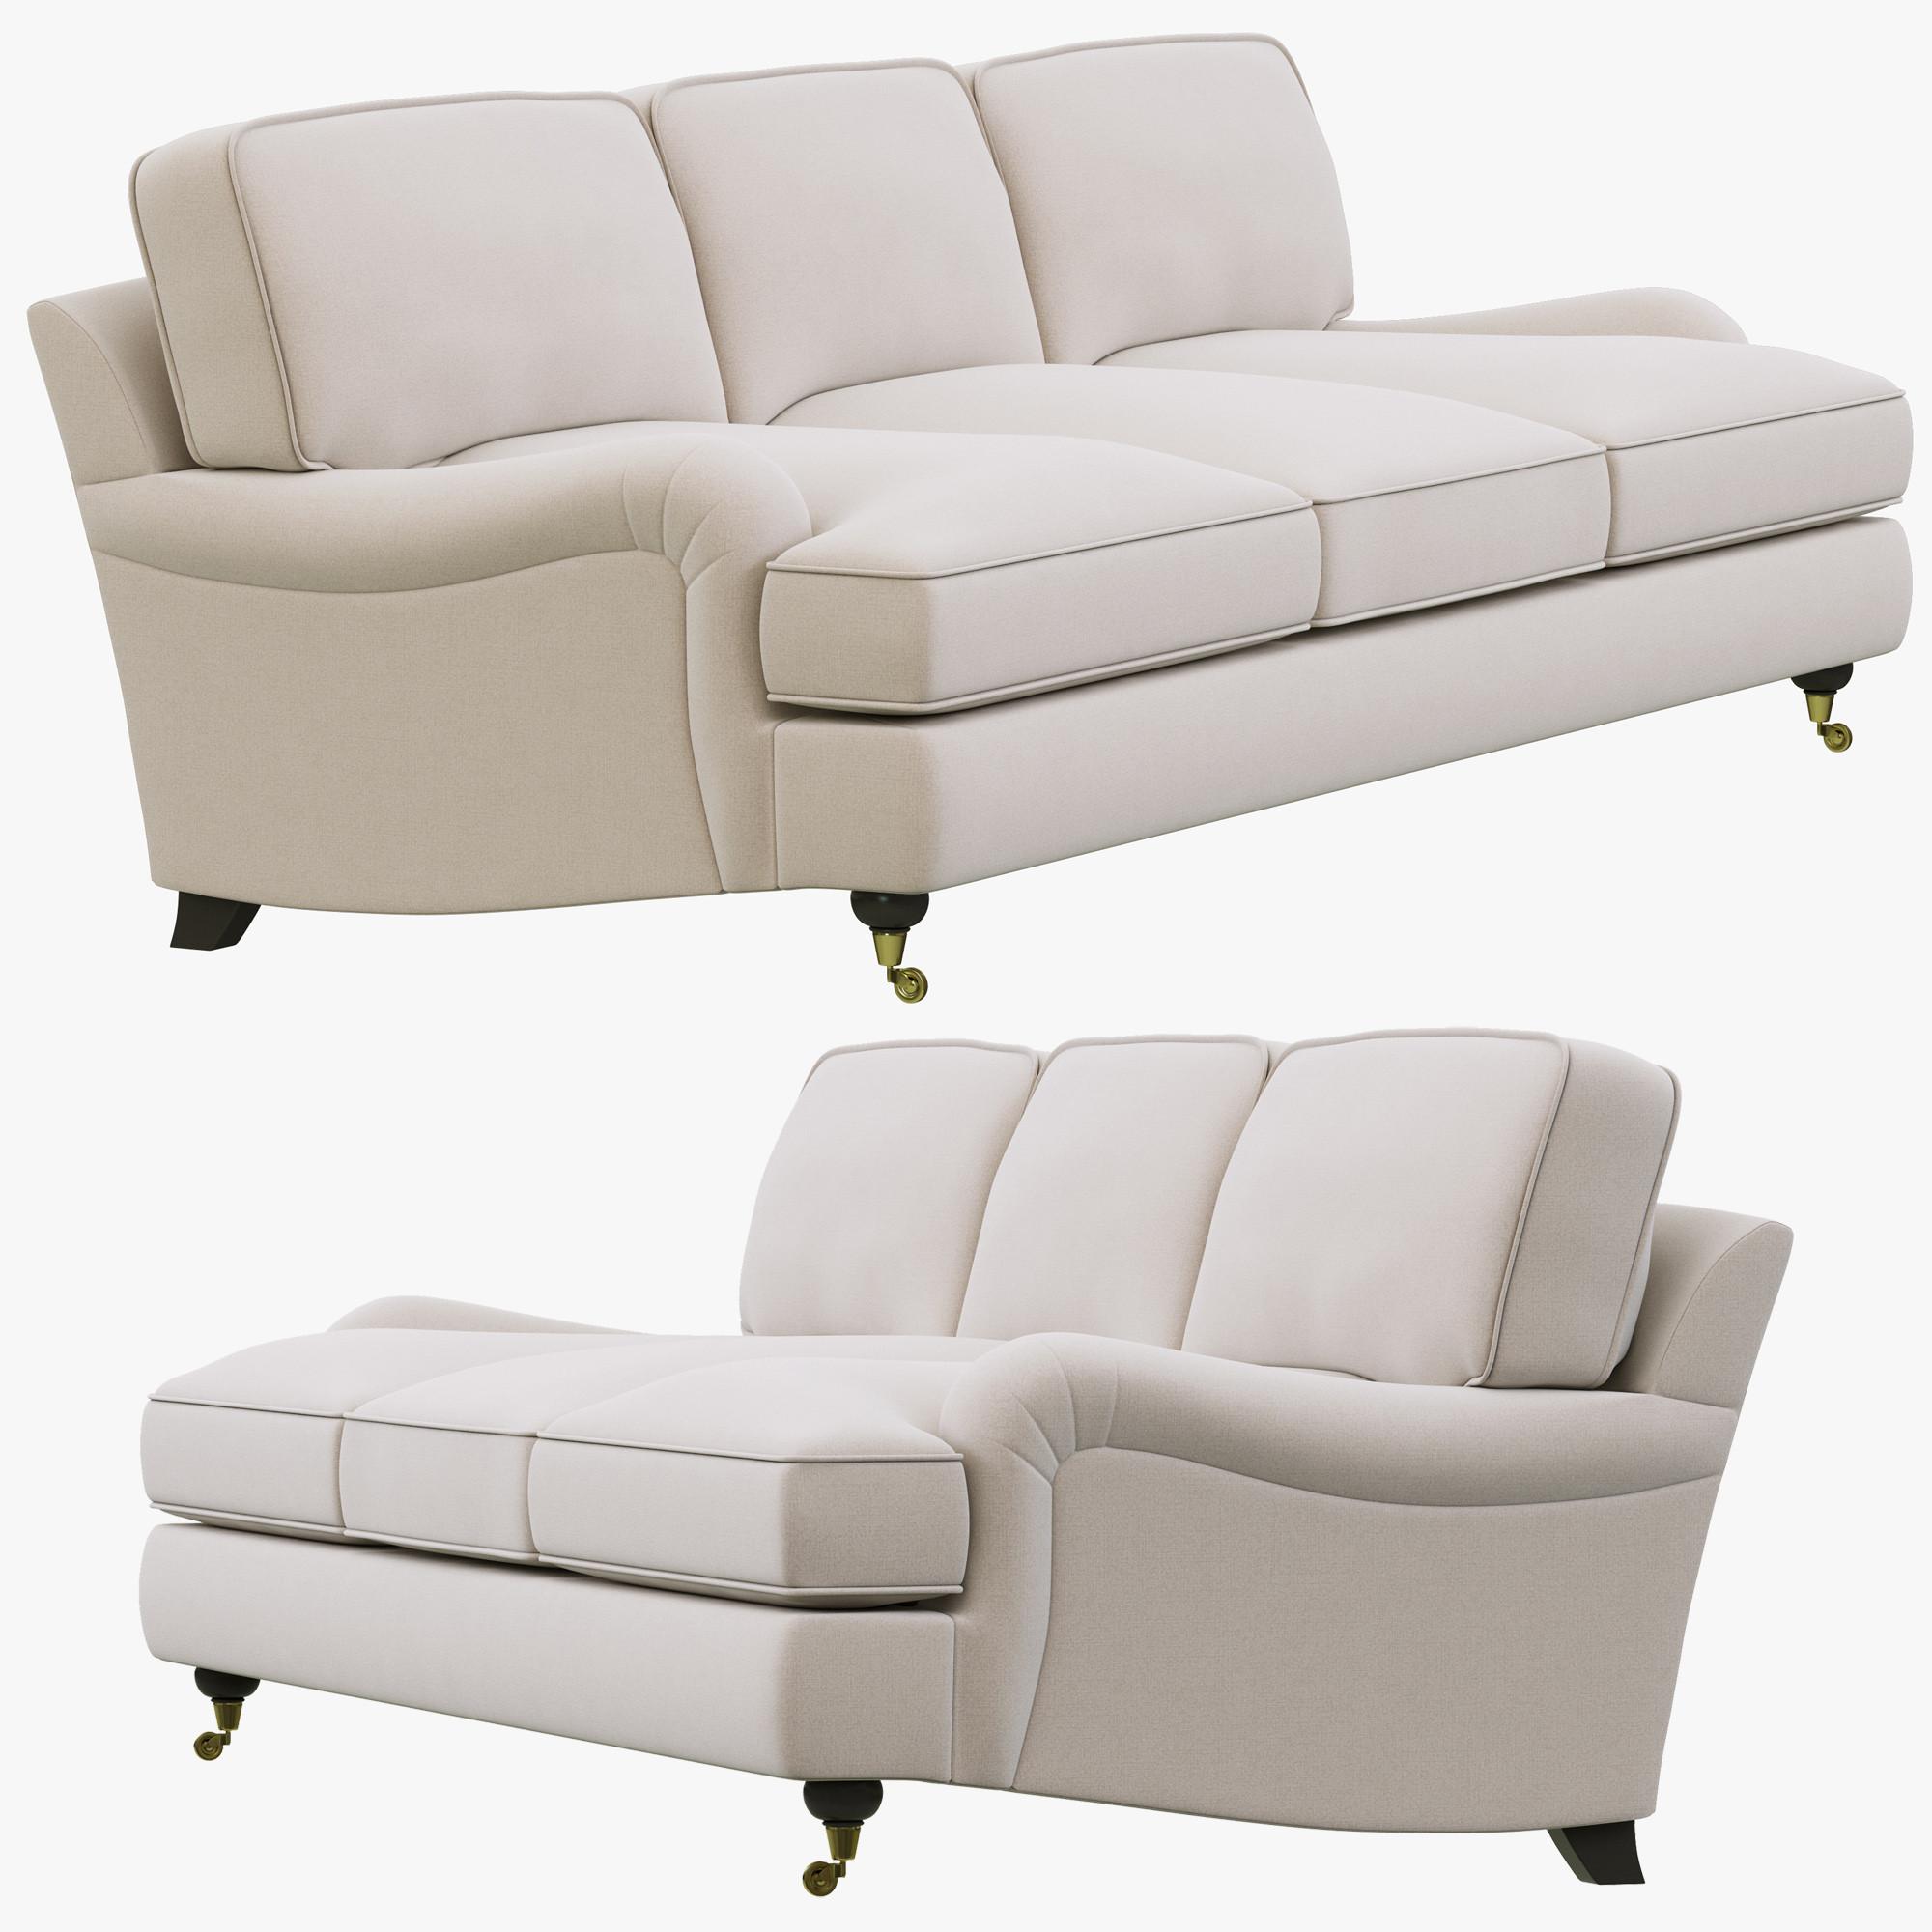 English Roll Arm Sofa: 3d Model Restoration Hardware English Roll